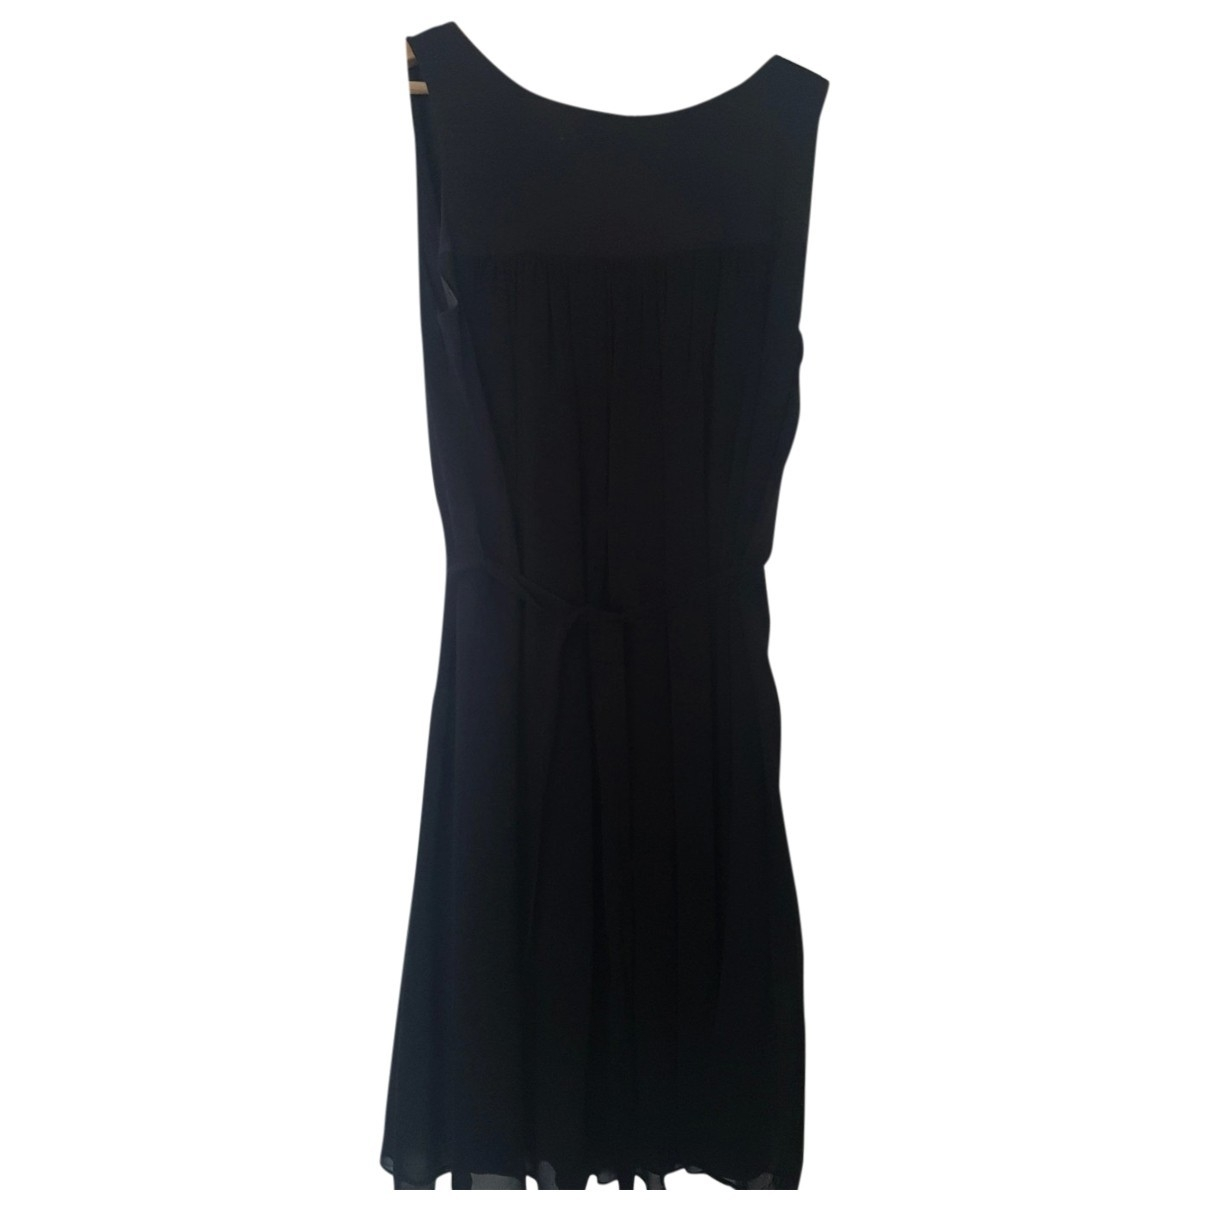 Karl Lagerfeld - Robe   pour femme en coton - elasthane - noir